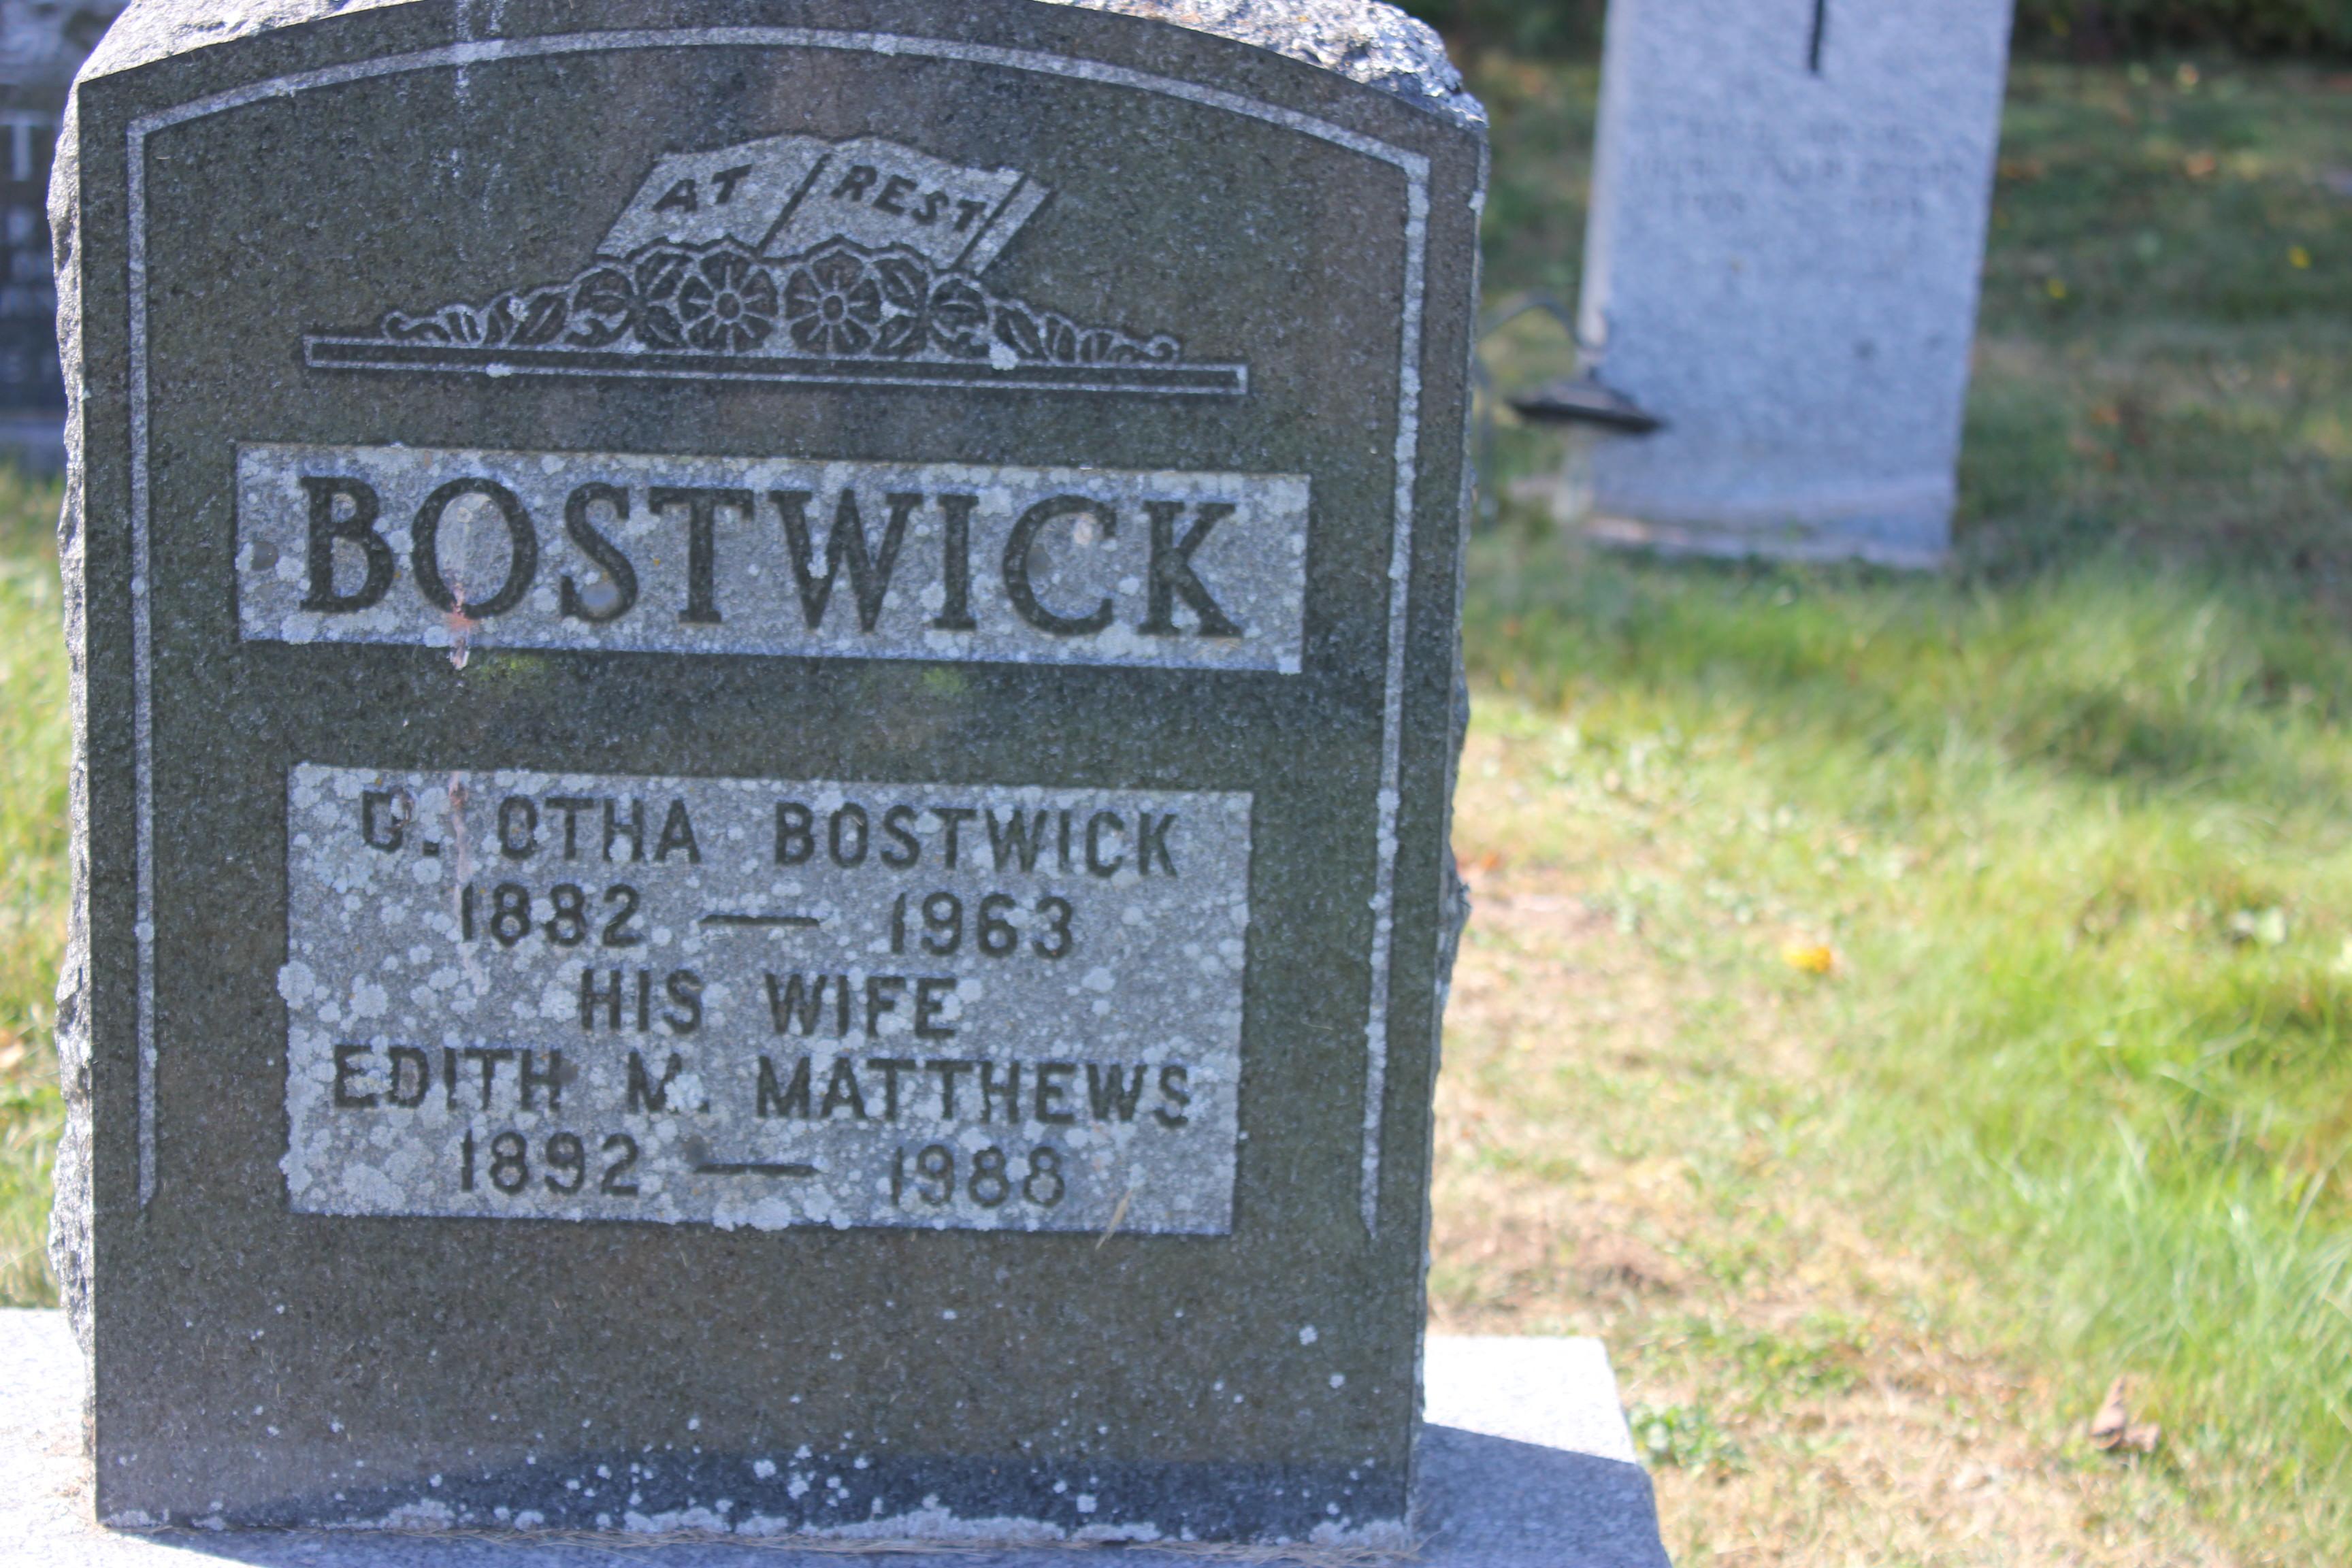 David Otha Bostwick